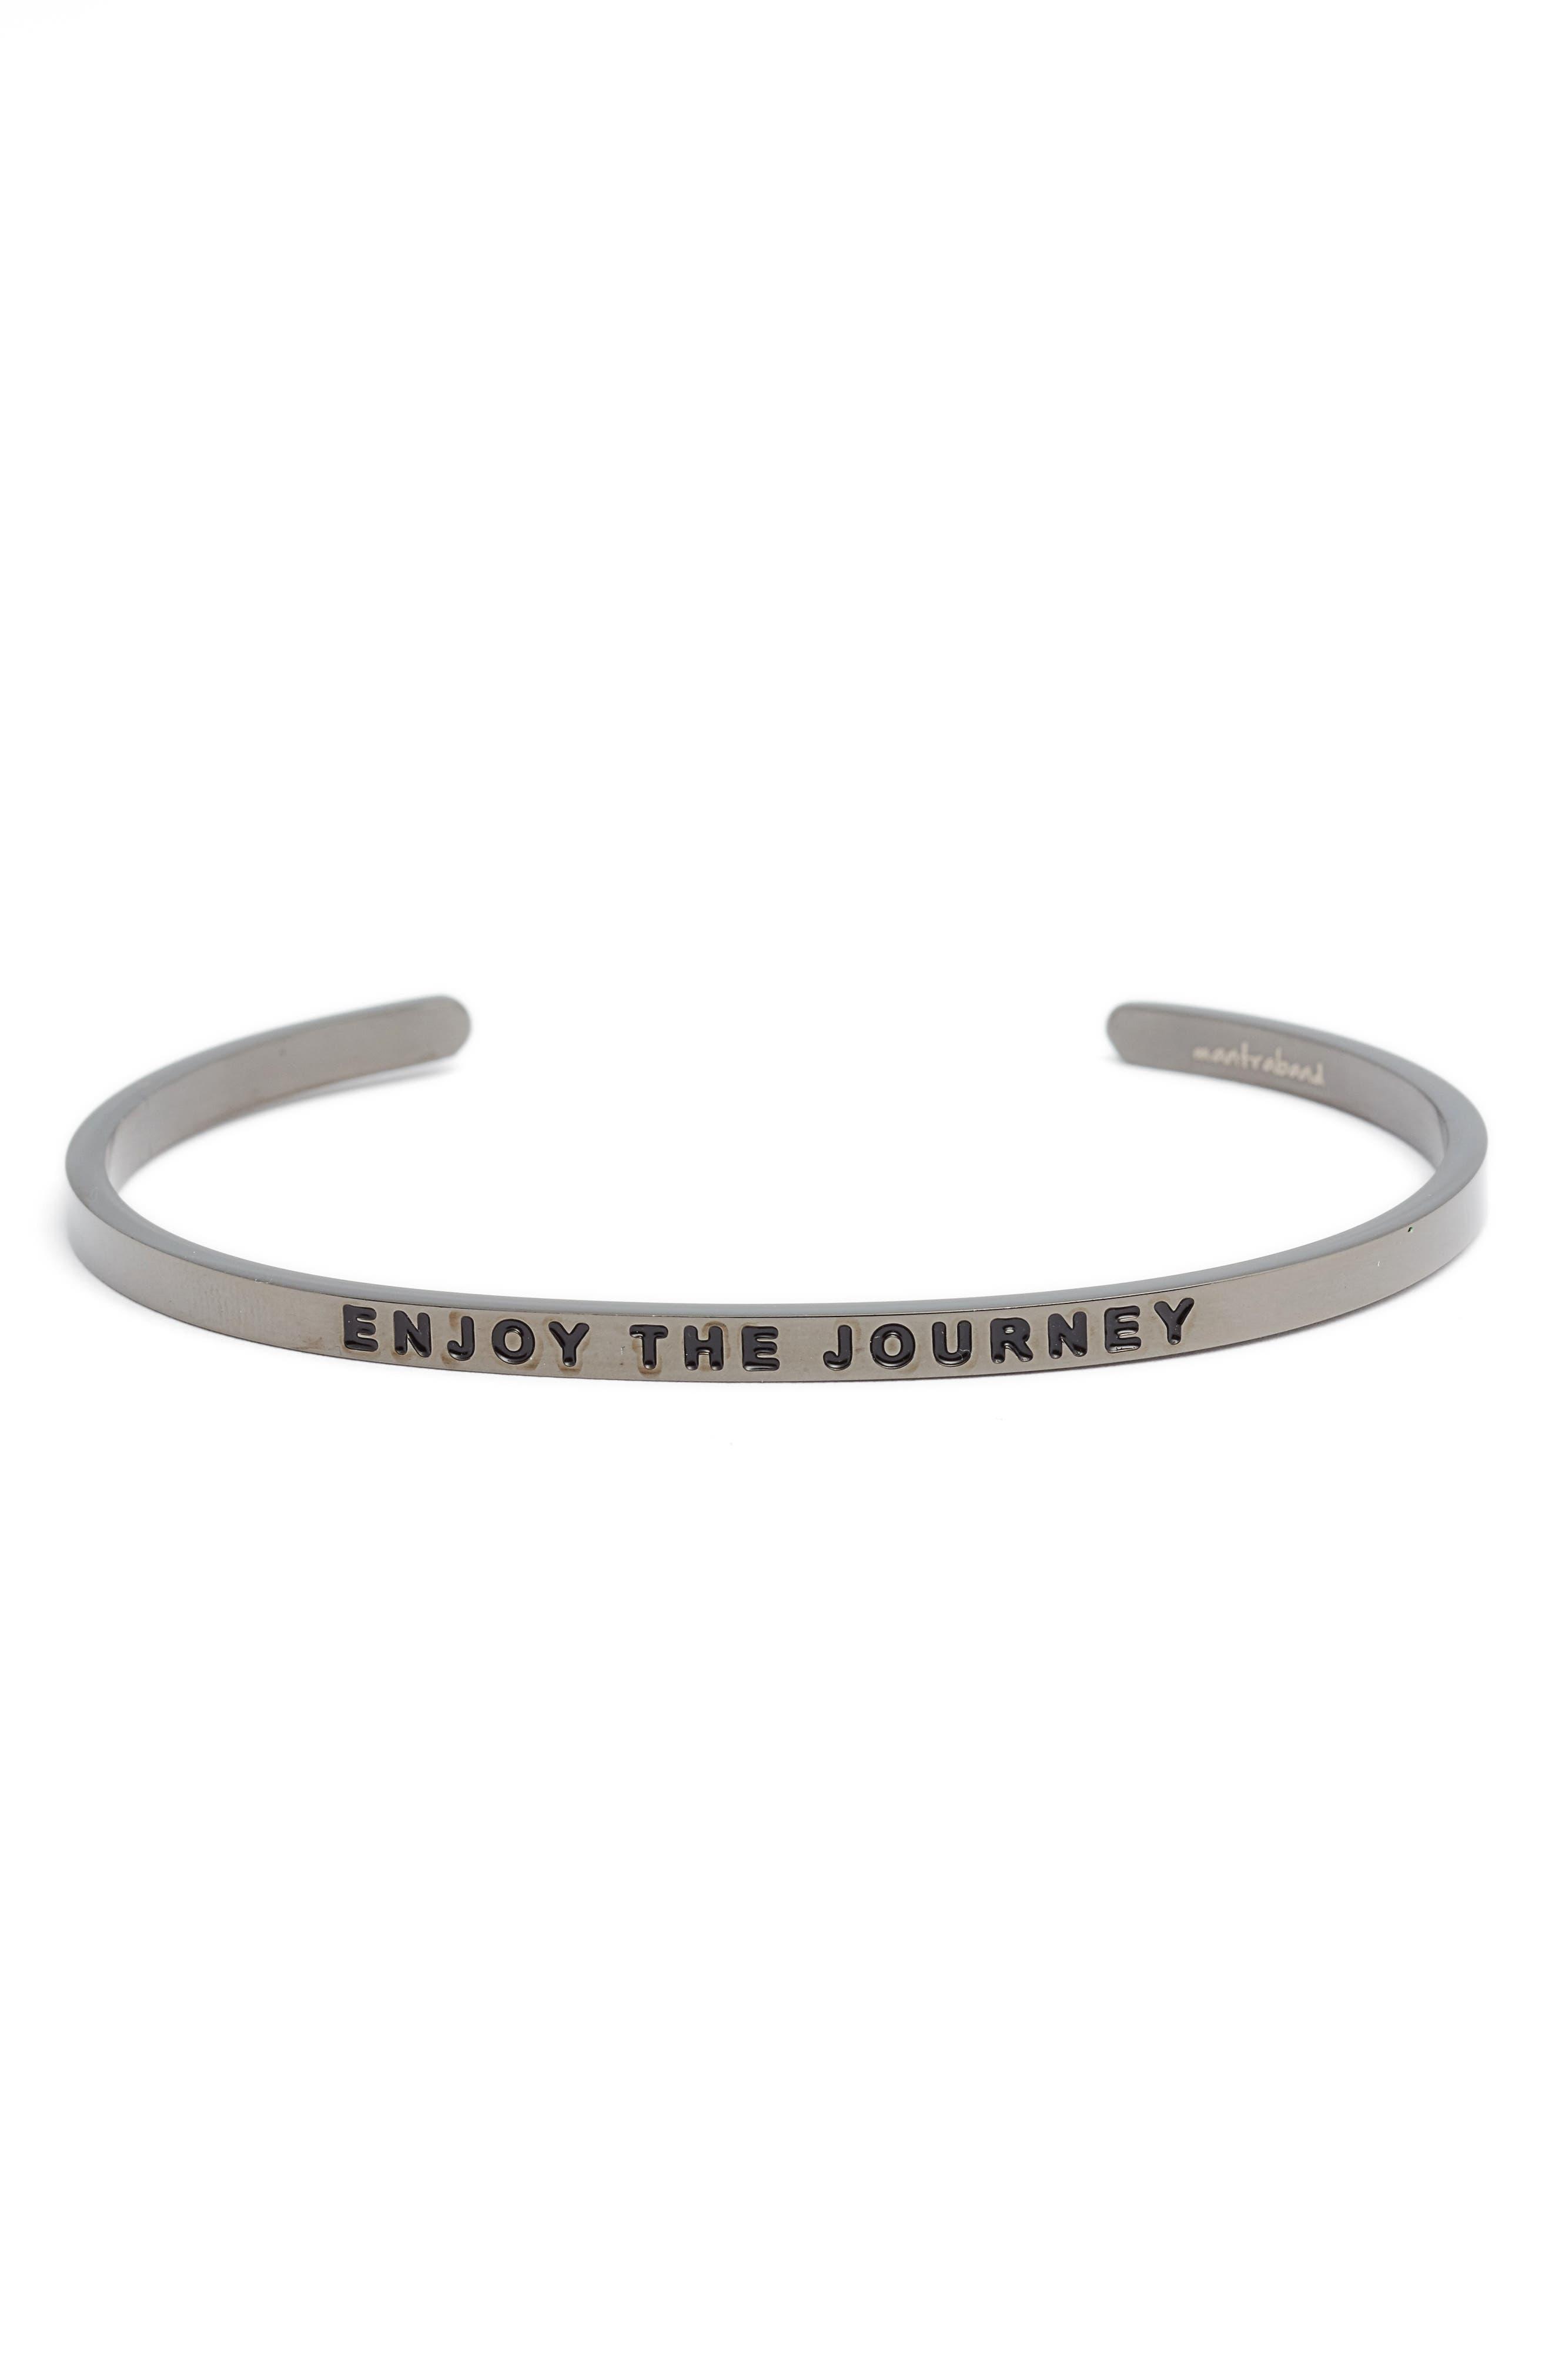 'Enjoy the Journey' Cuff,                             Main thumbnail 1, color,                             MOON GRAY